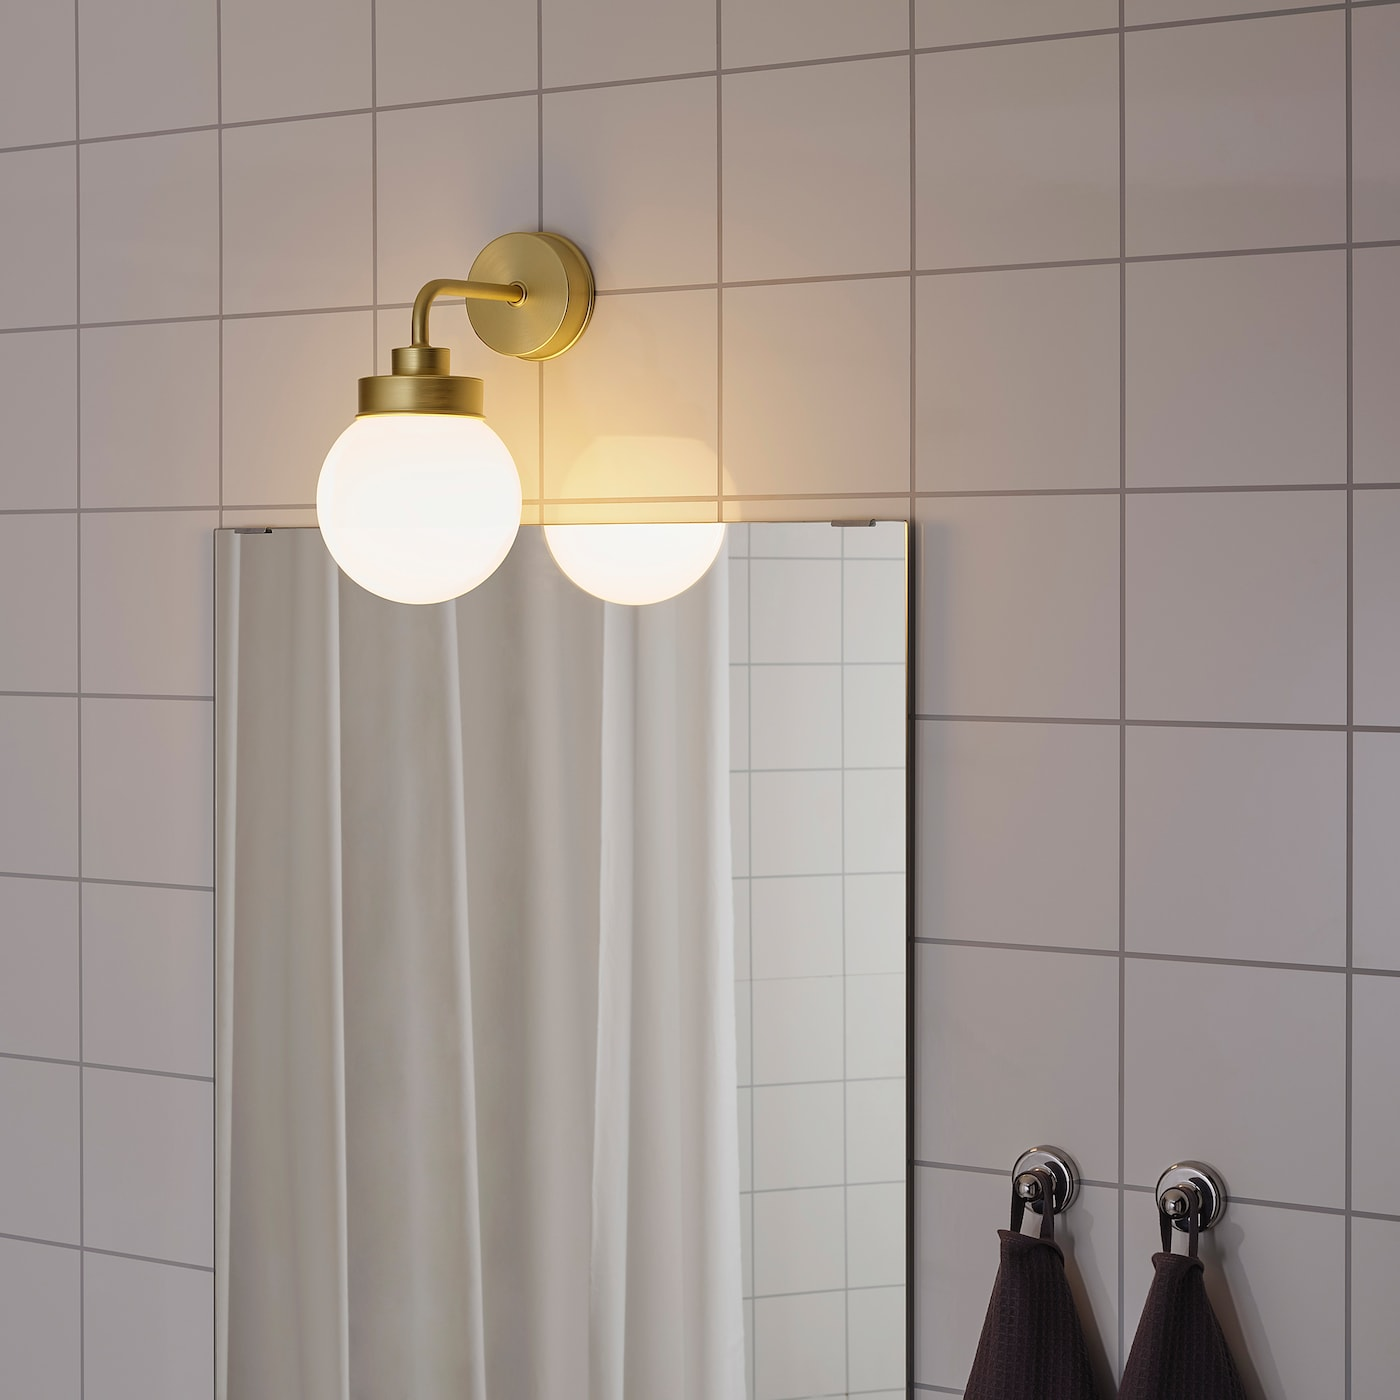 Inspiring Applique Murale Salle De Bains Ikea